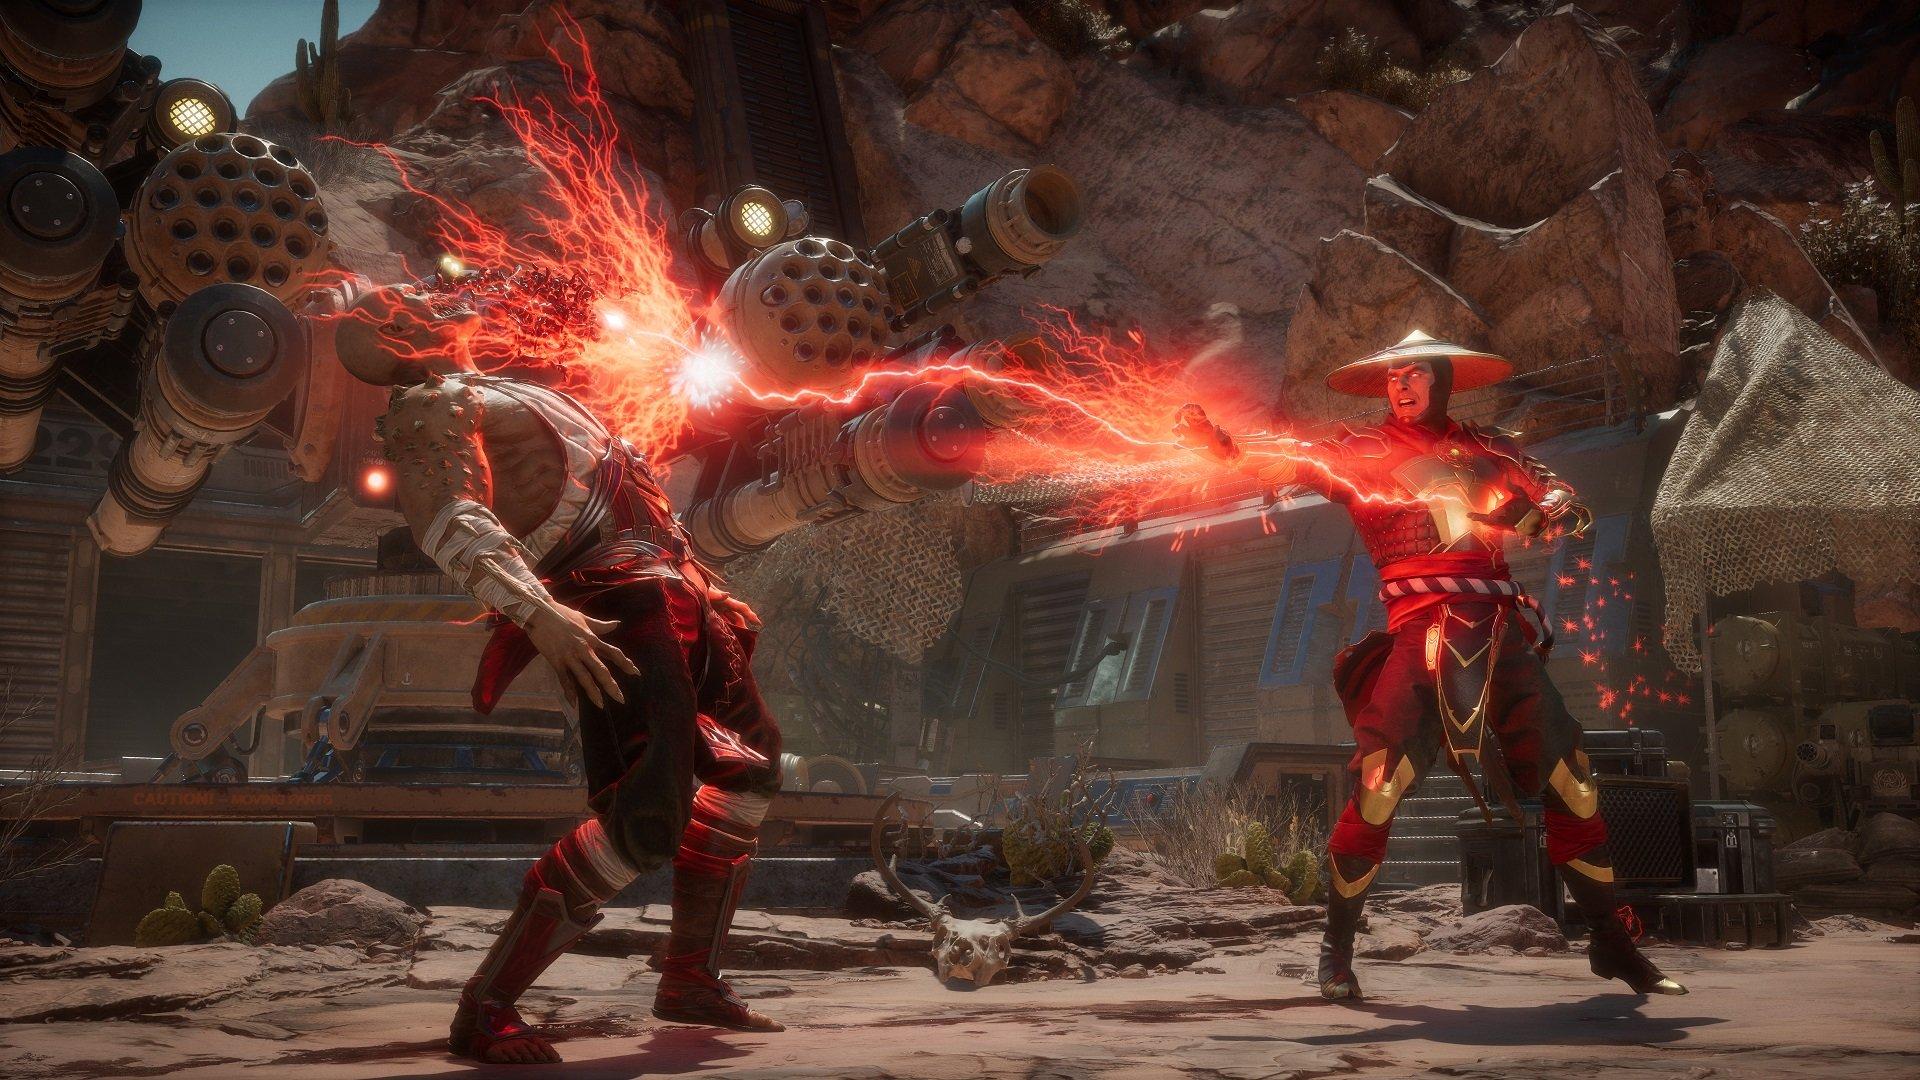 Mortal Kombat 11 All Spawn Vs. Raiden Dialogue - YouTube